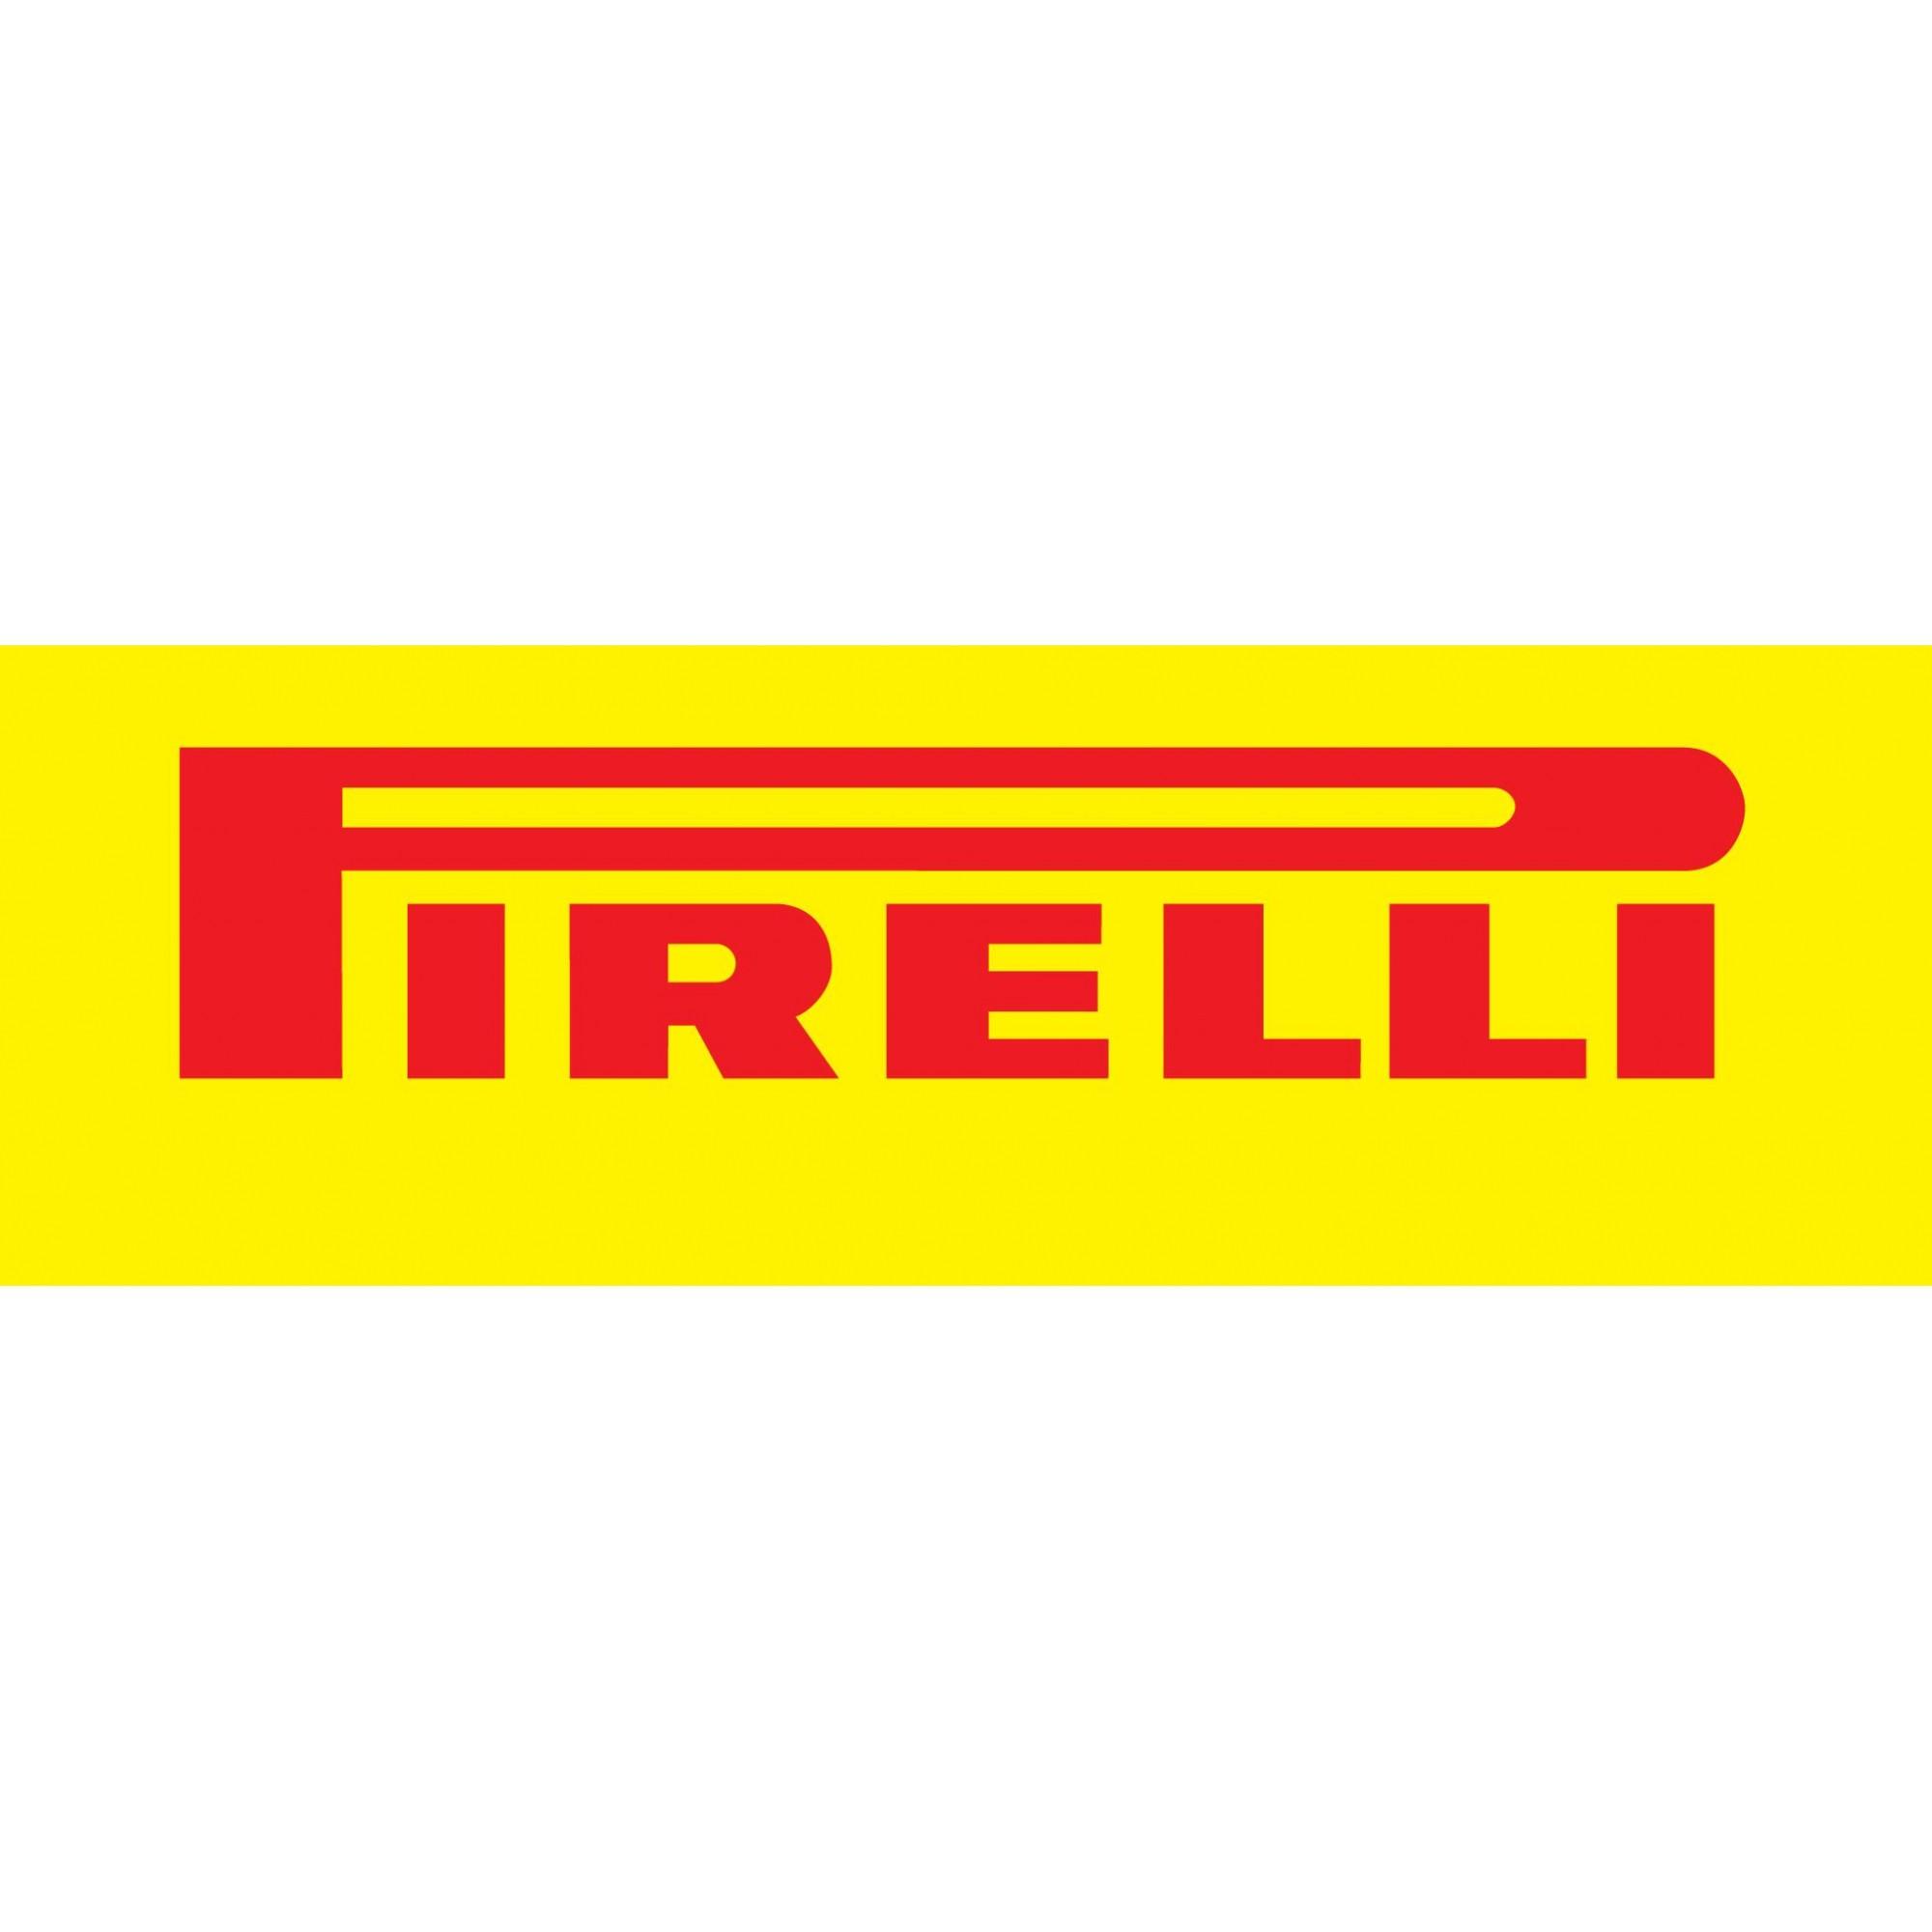 Par Pneu Next 250 110 + 140 Diablo Rosso Ii Pirelli